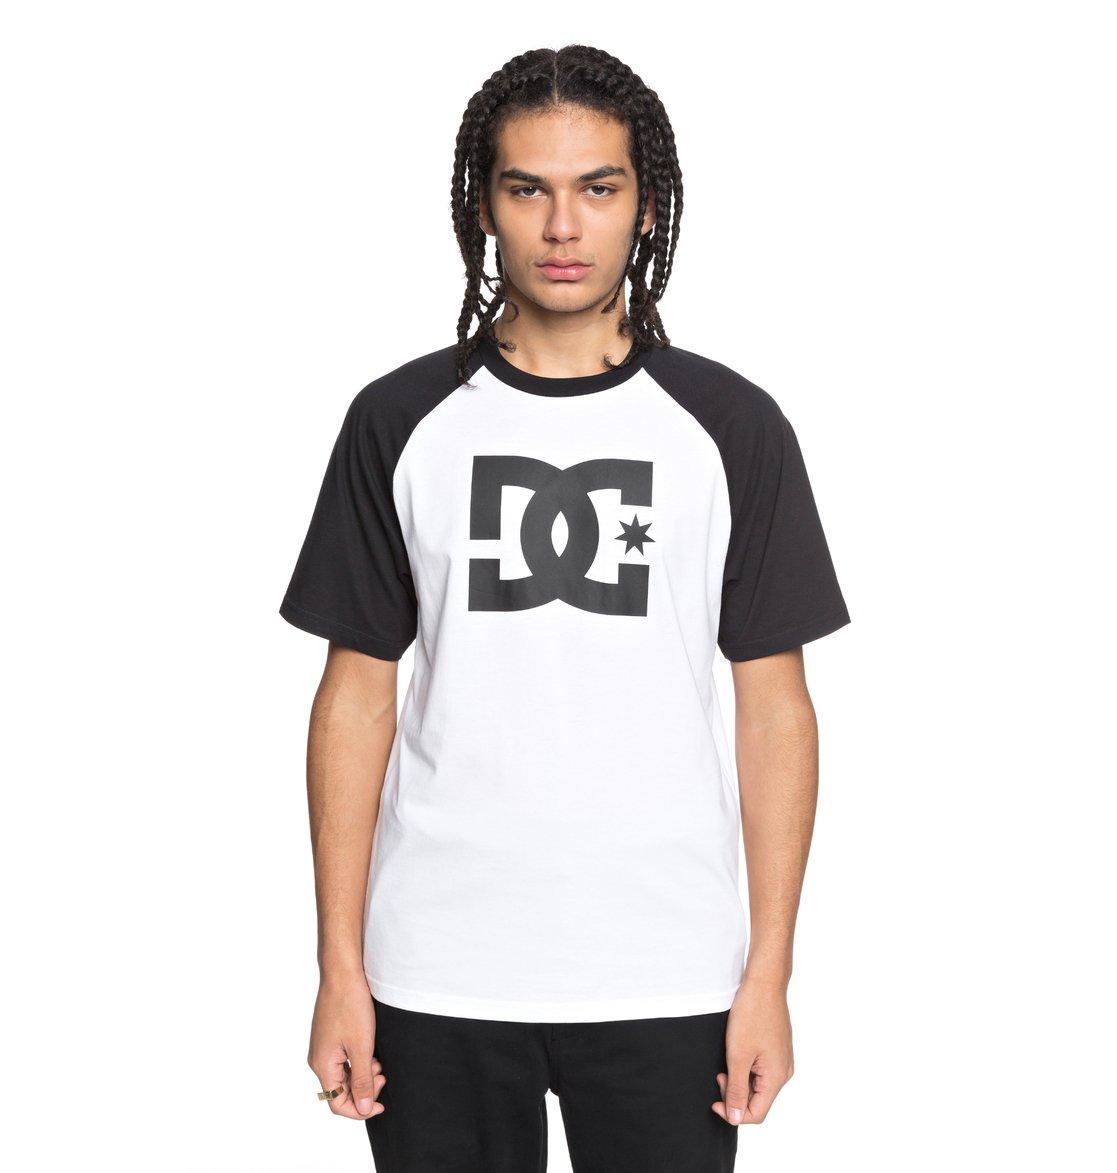 49d5b008c5e6 0 Star - T-Shirt for Men EDYZT03802 DC Shoes